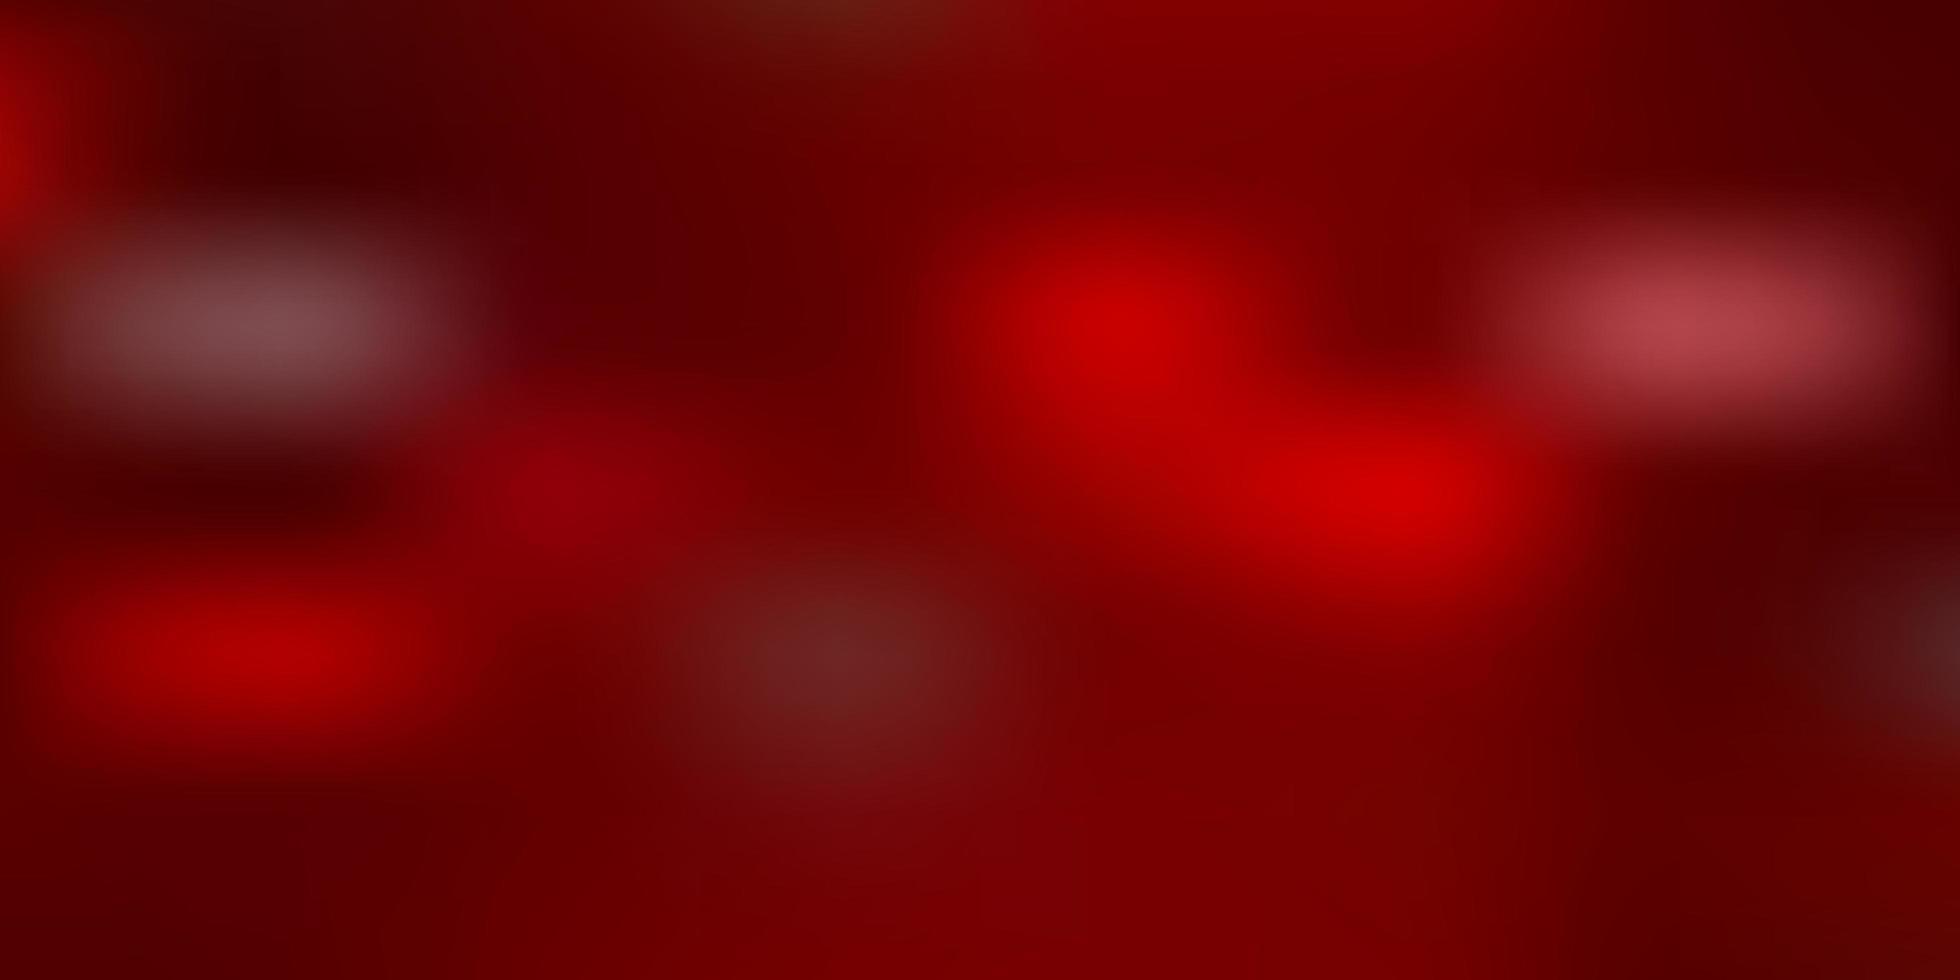 ljusröd vektor suddig layout.